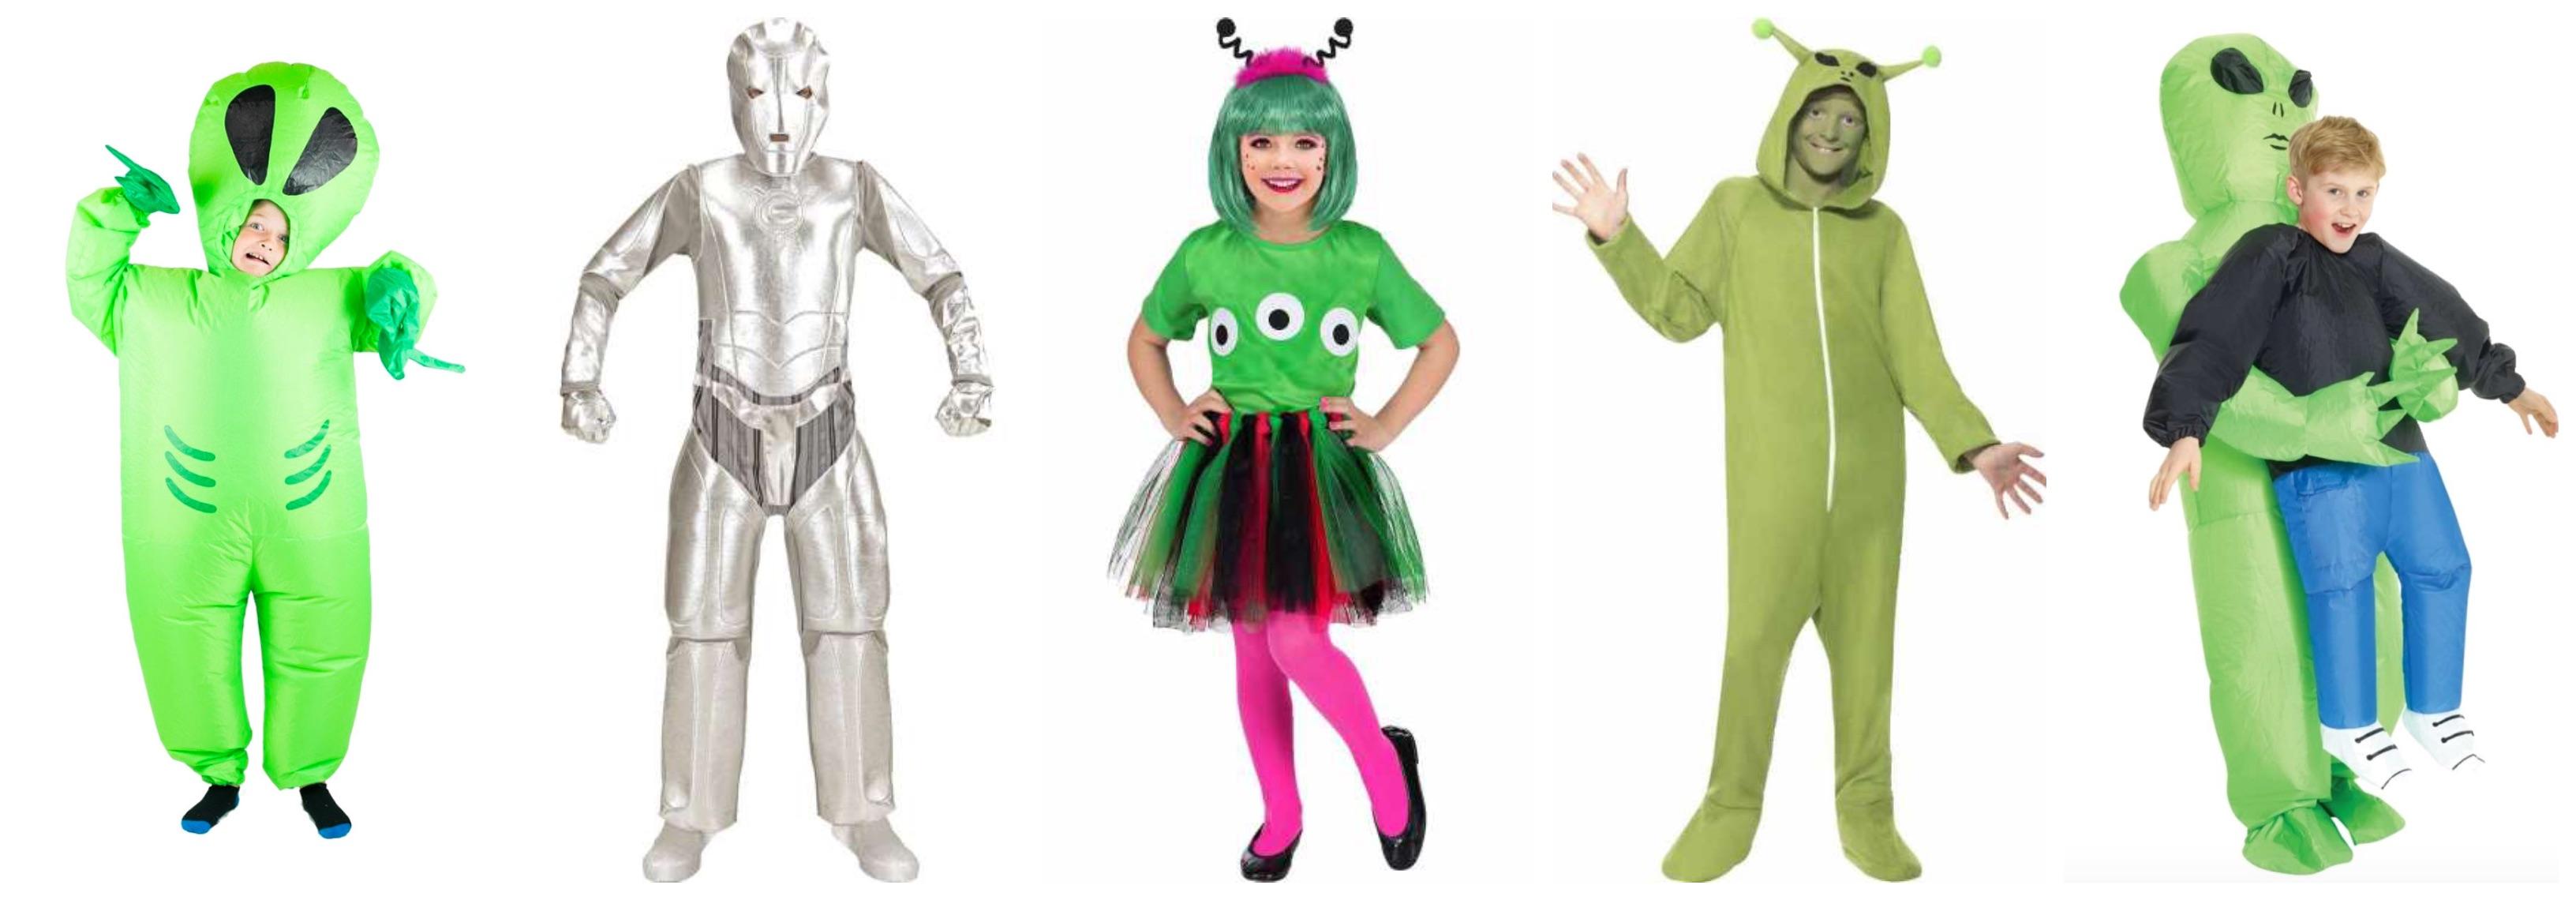 alien kostume til børn - Alien kostume til børn